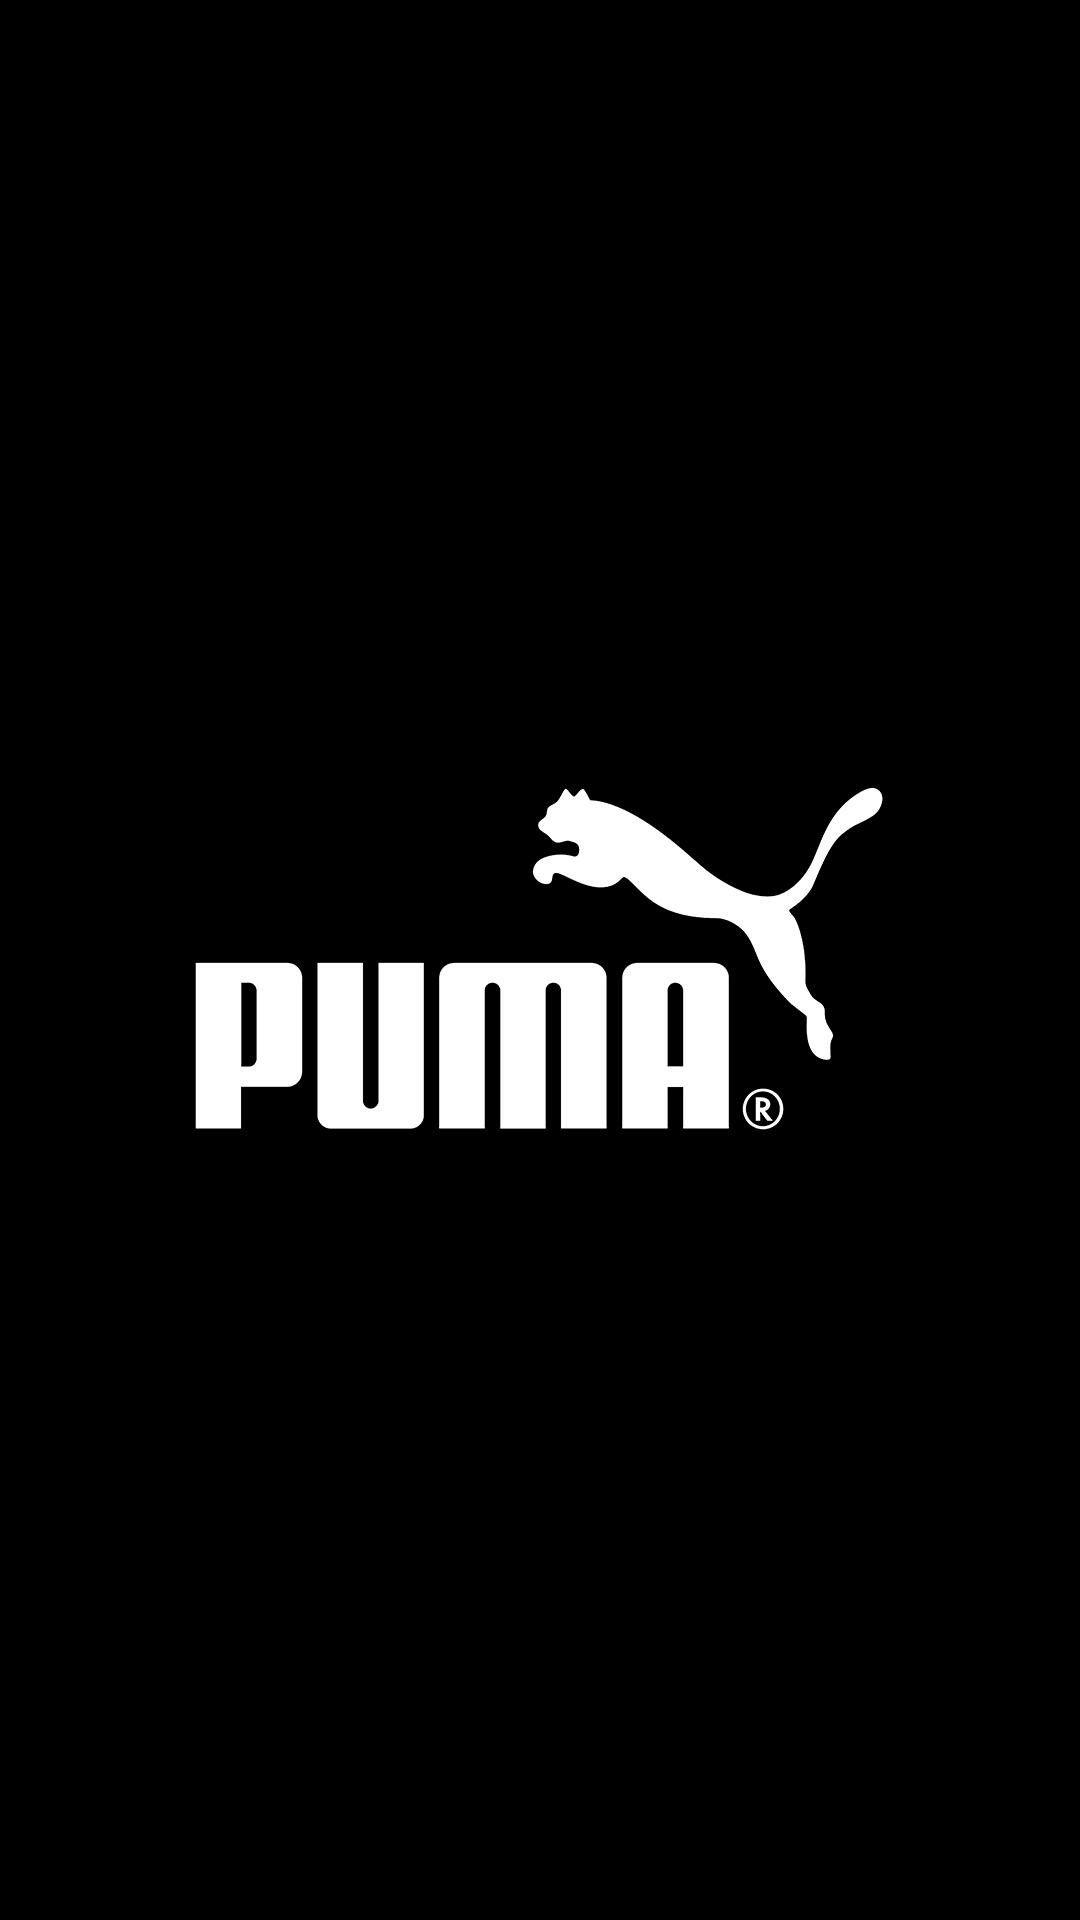 pinsamantha keller on puma | pinterest | pumas, wallpaper and